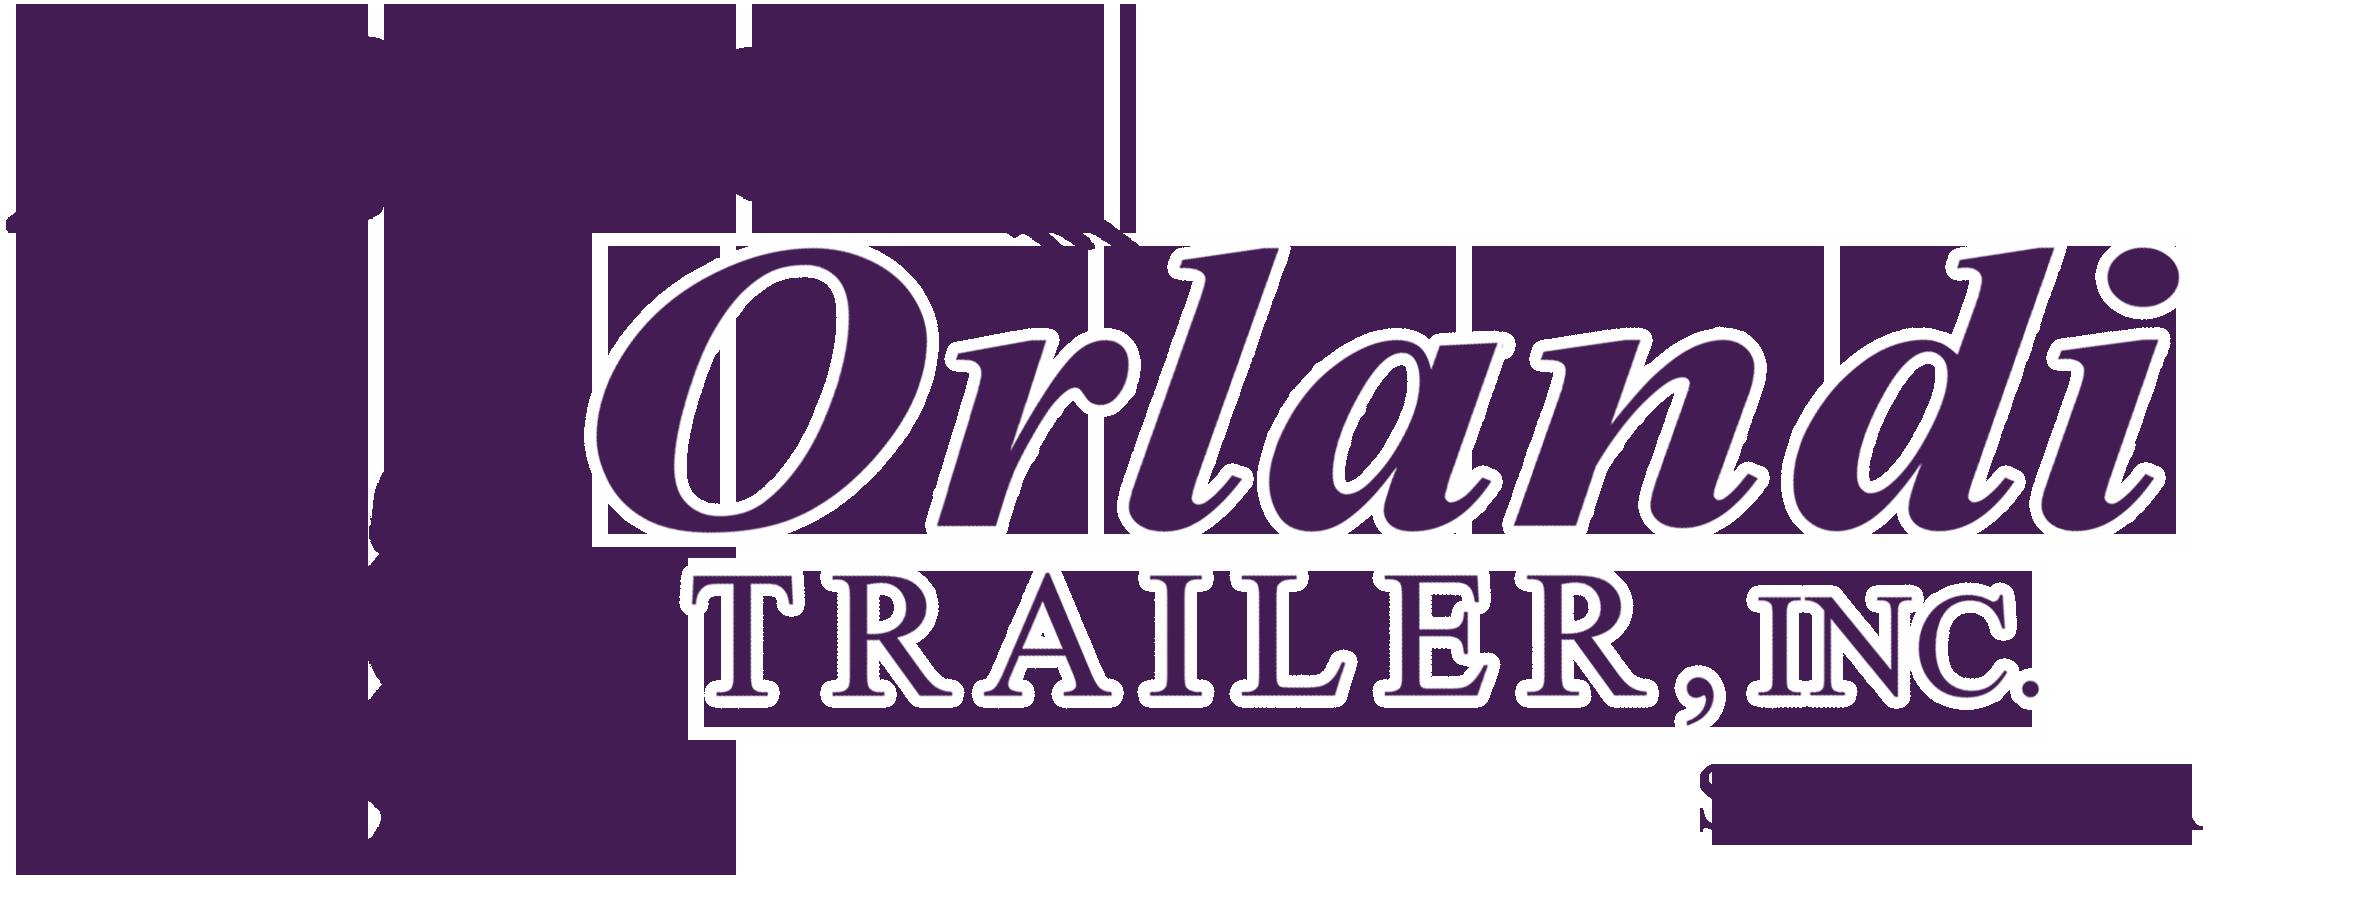 Orlandi Trailer, INC